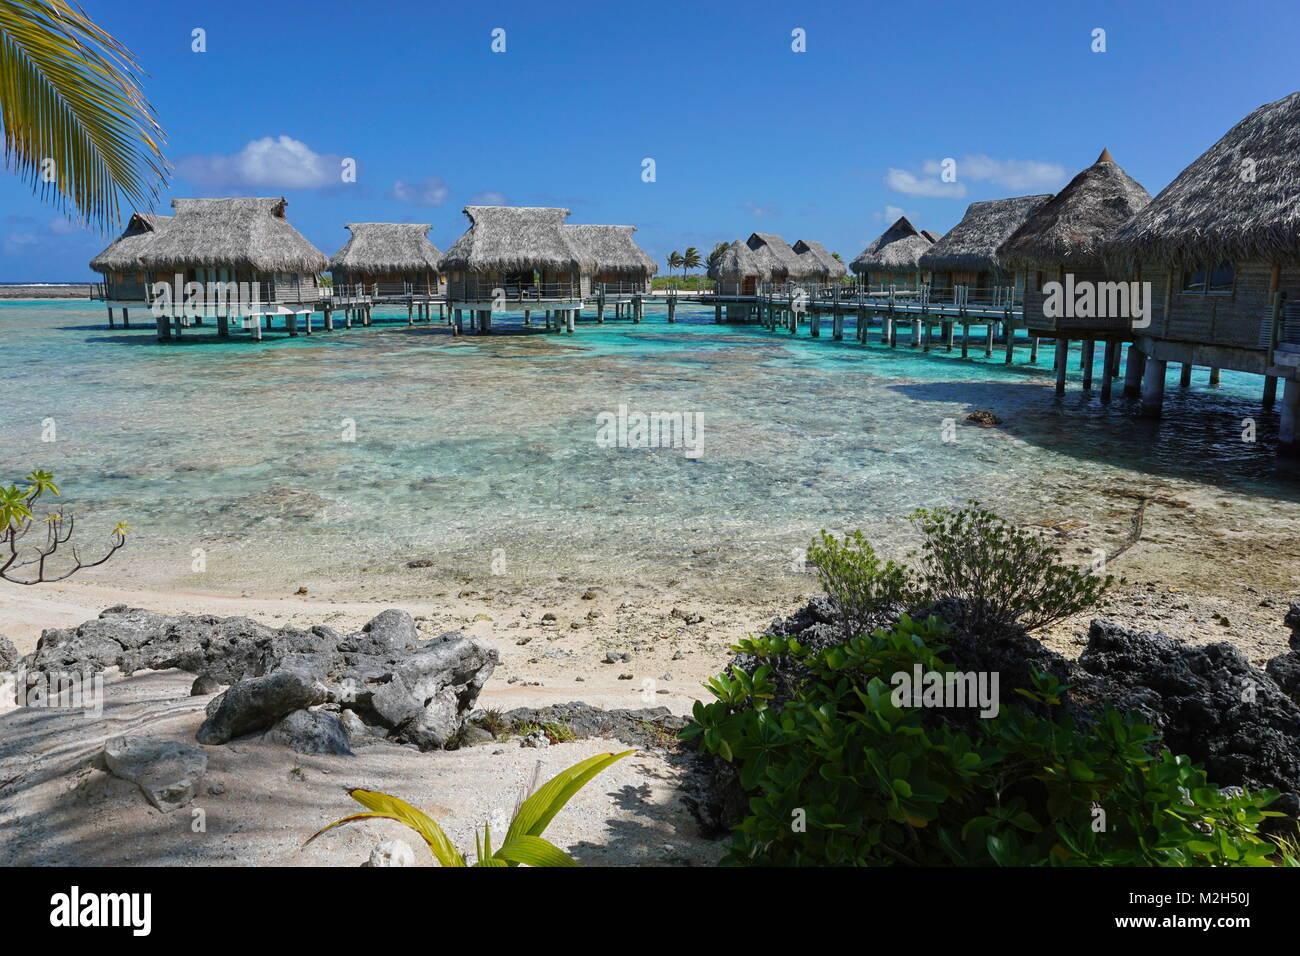 Tropical Island Resort con bungalows su stilt in laguna, Tikehau Atoll, Tuamotus, Polinesia francese, oceano pacifico, Immagini Stock